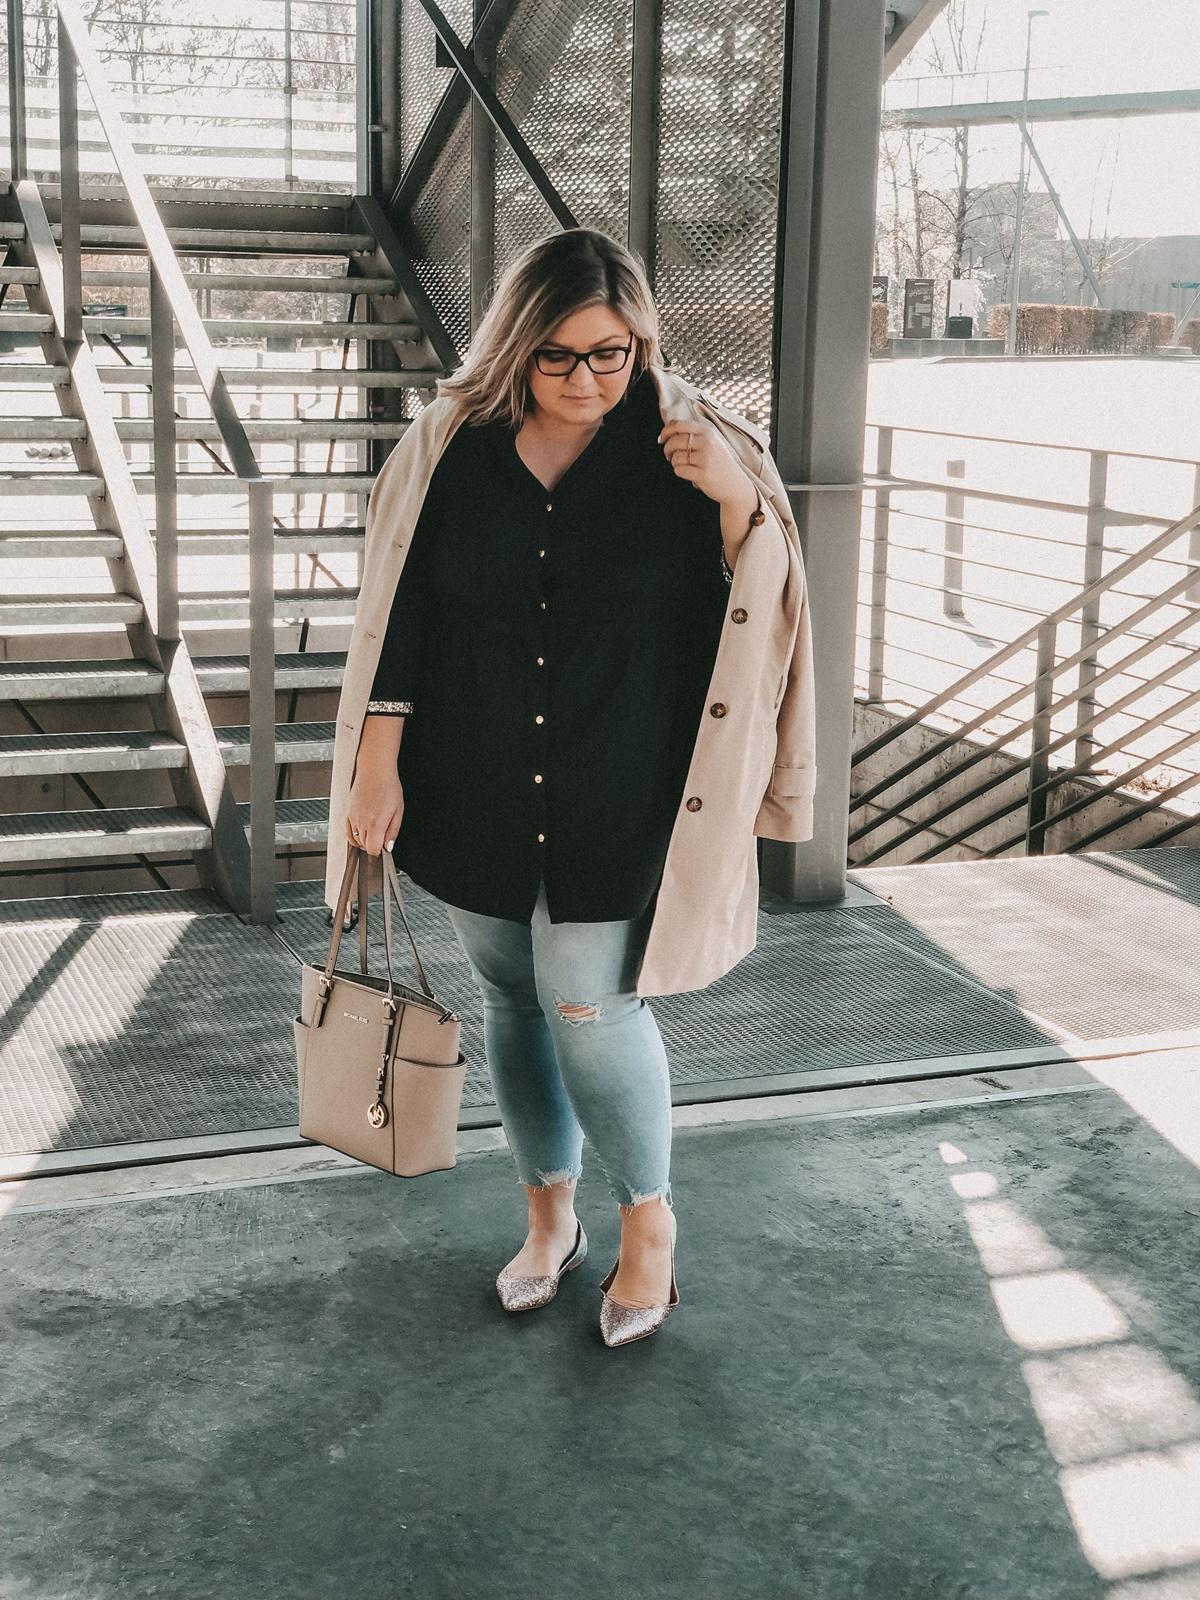 CITALEA Frühjahres Mode 2019 elabonbonella plus size fashion blog11